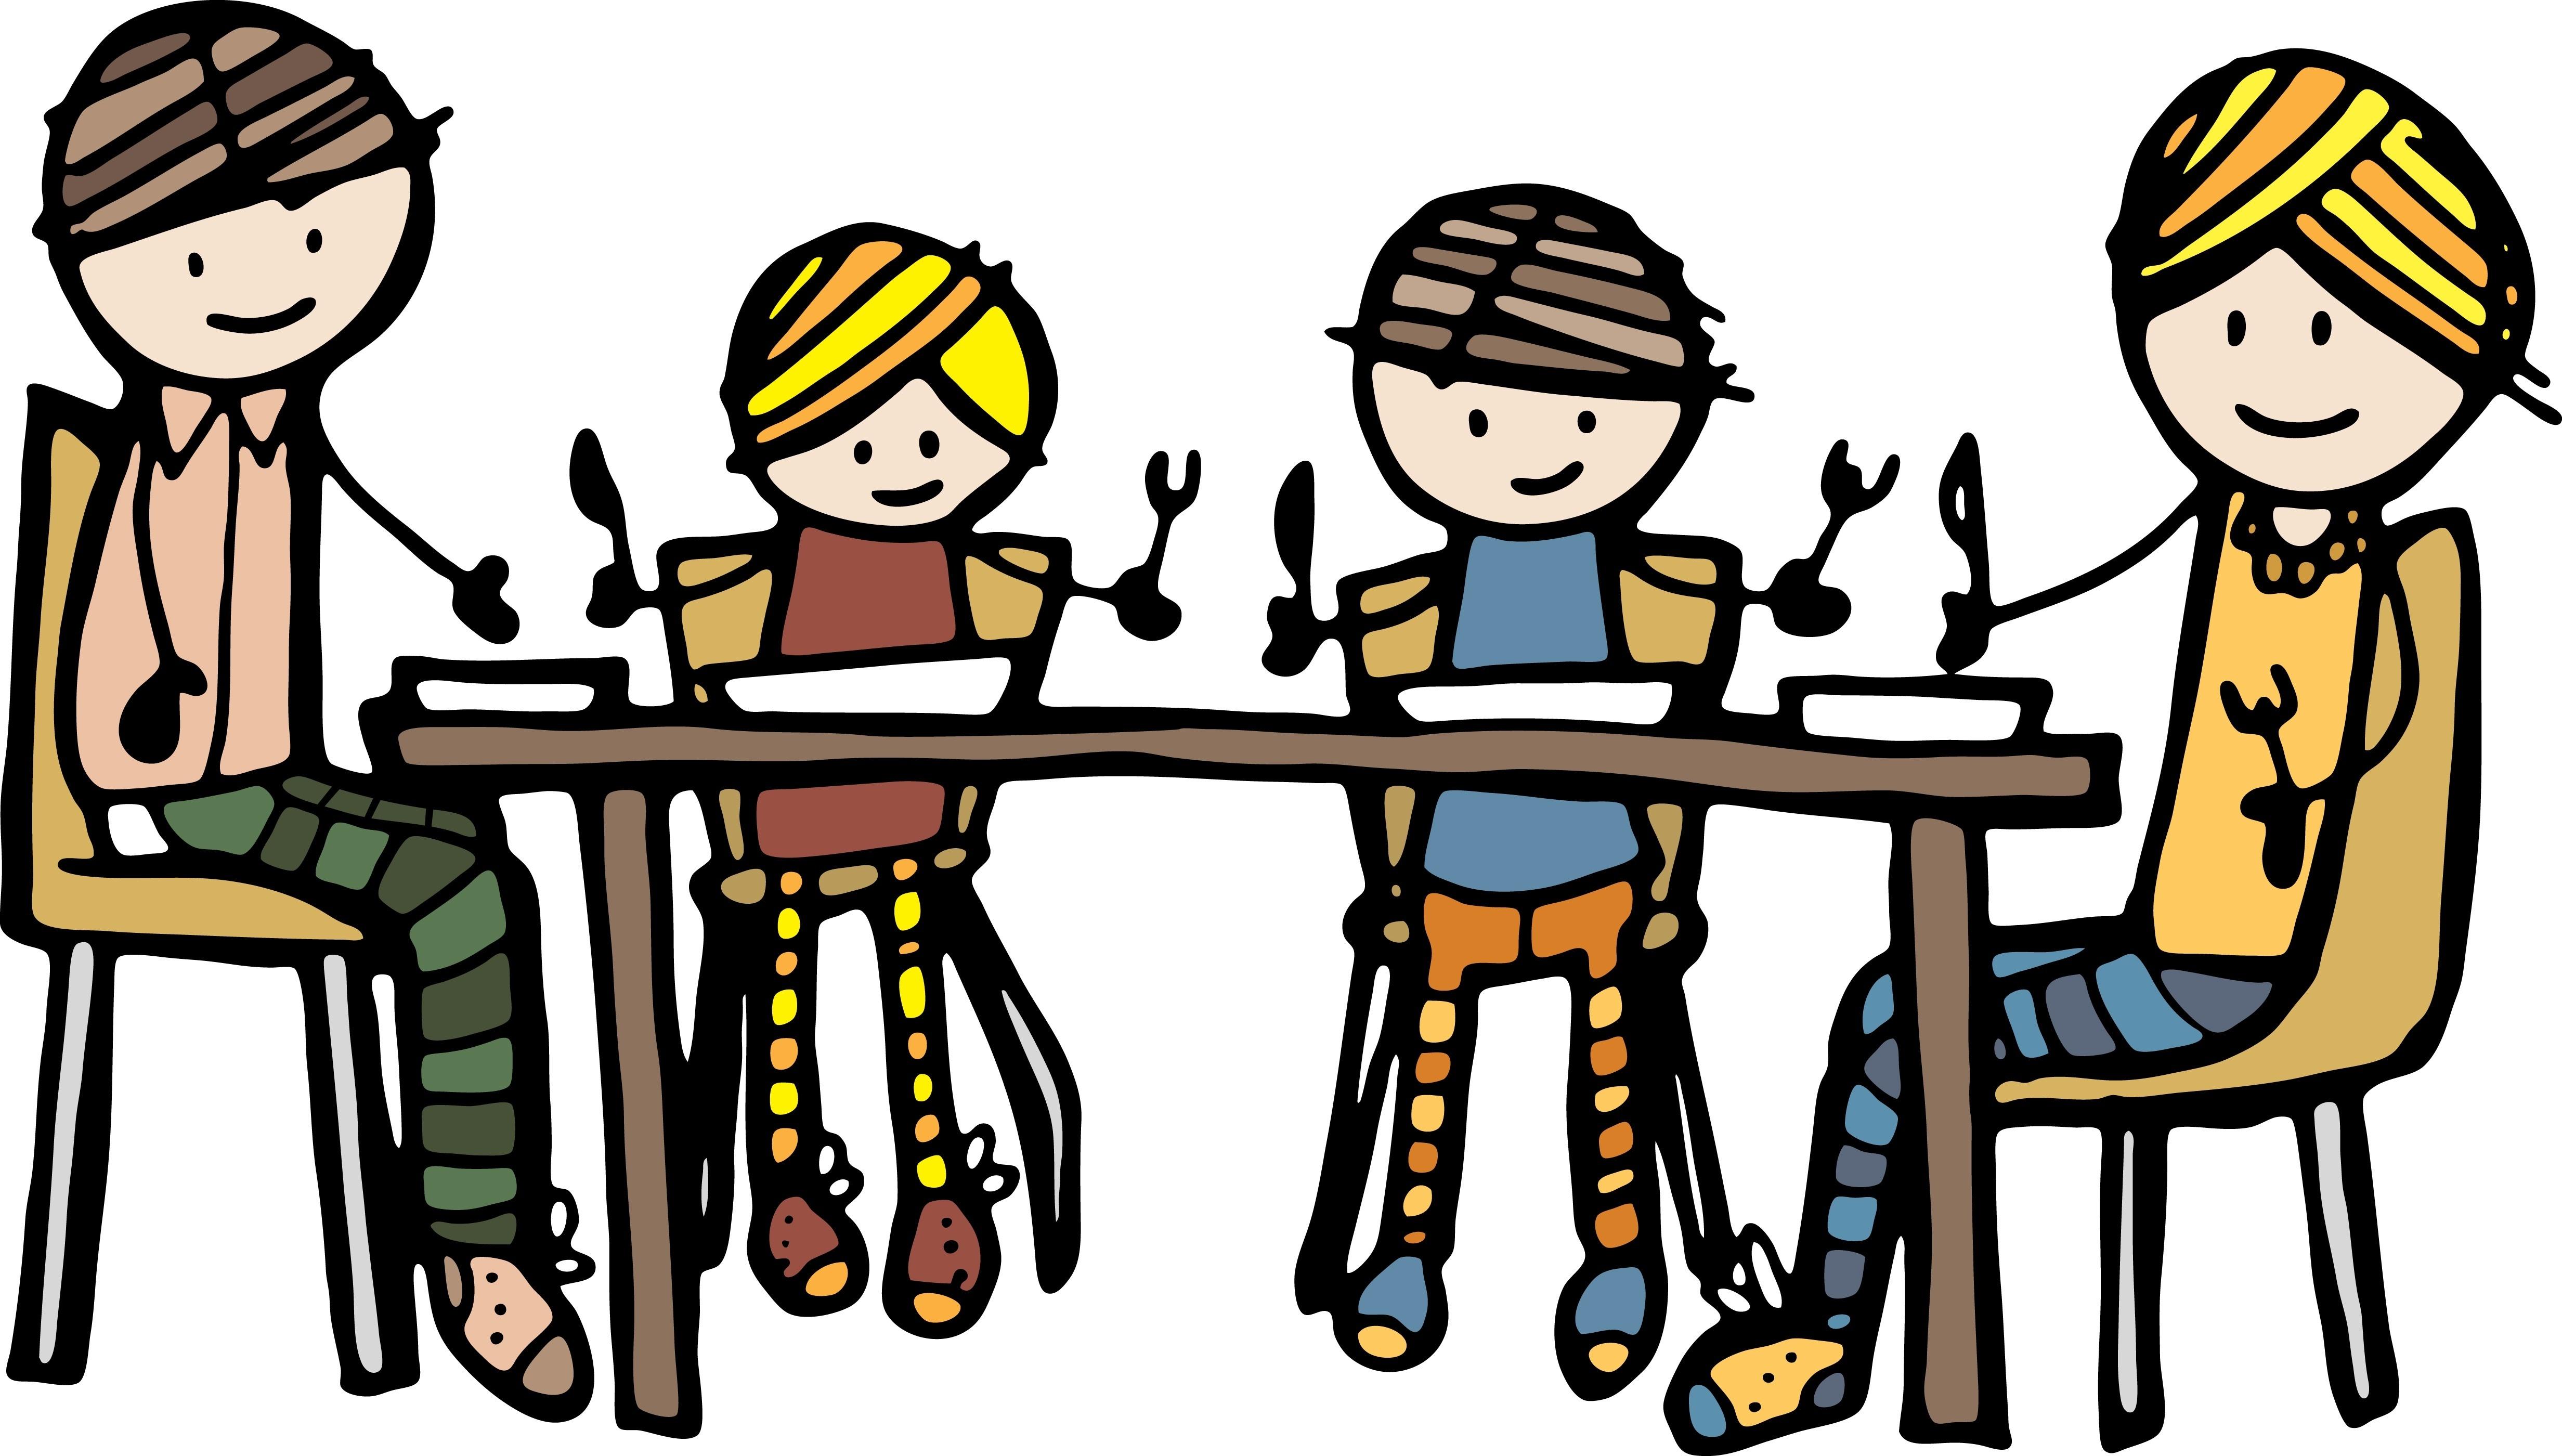 Table time creating positive. Feast clipart dinnertime